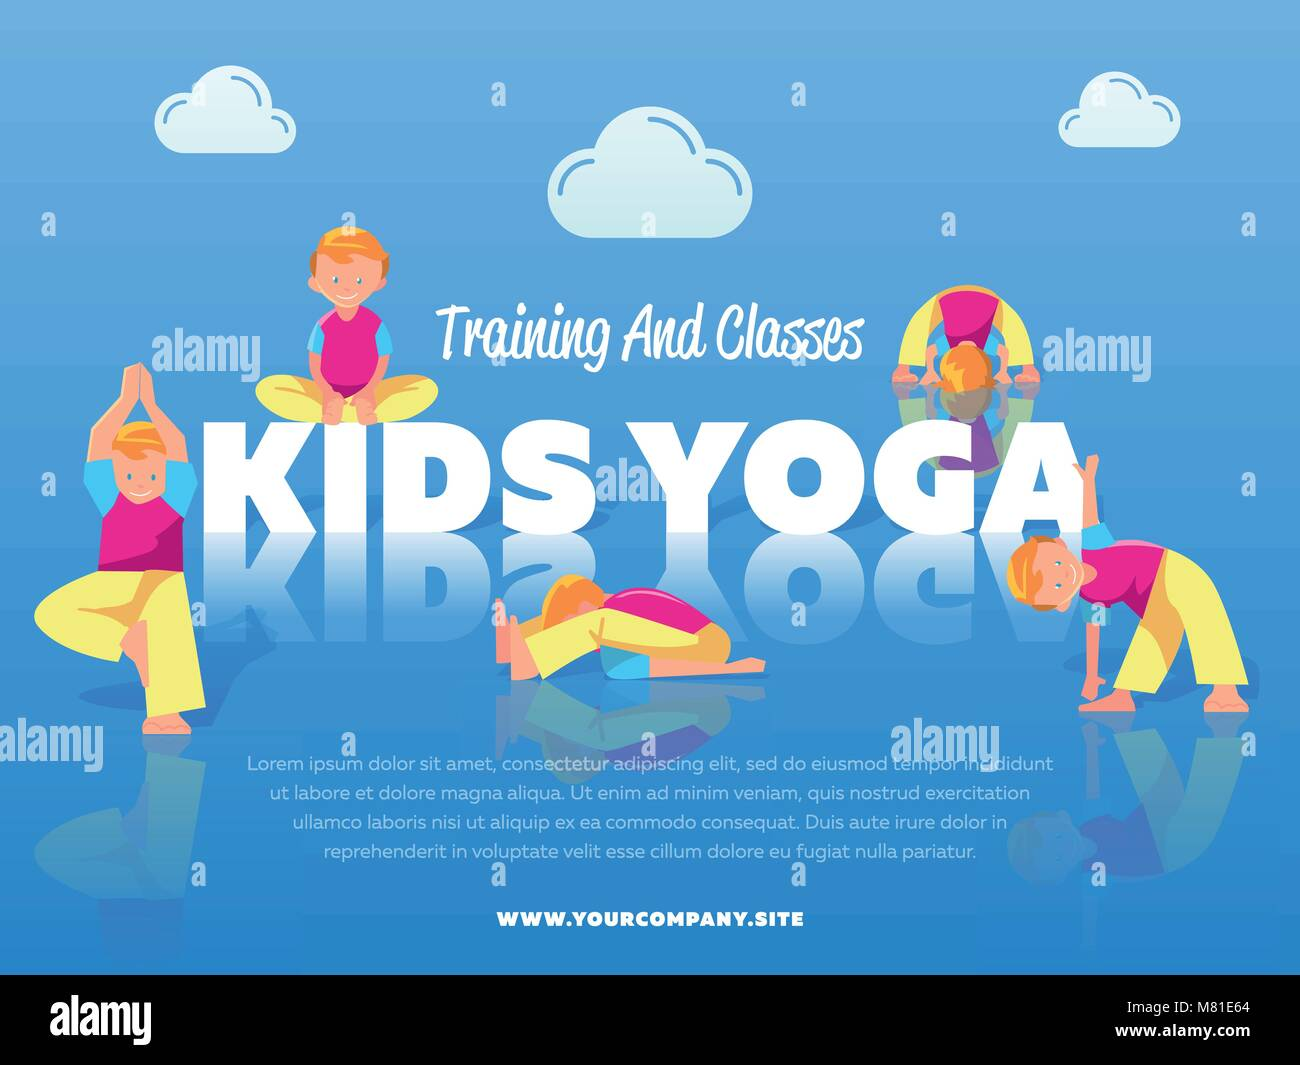 Training And Classes Kids Yoga Banner Stock Vector Image Art Alamy